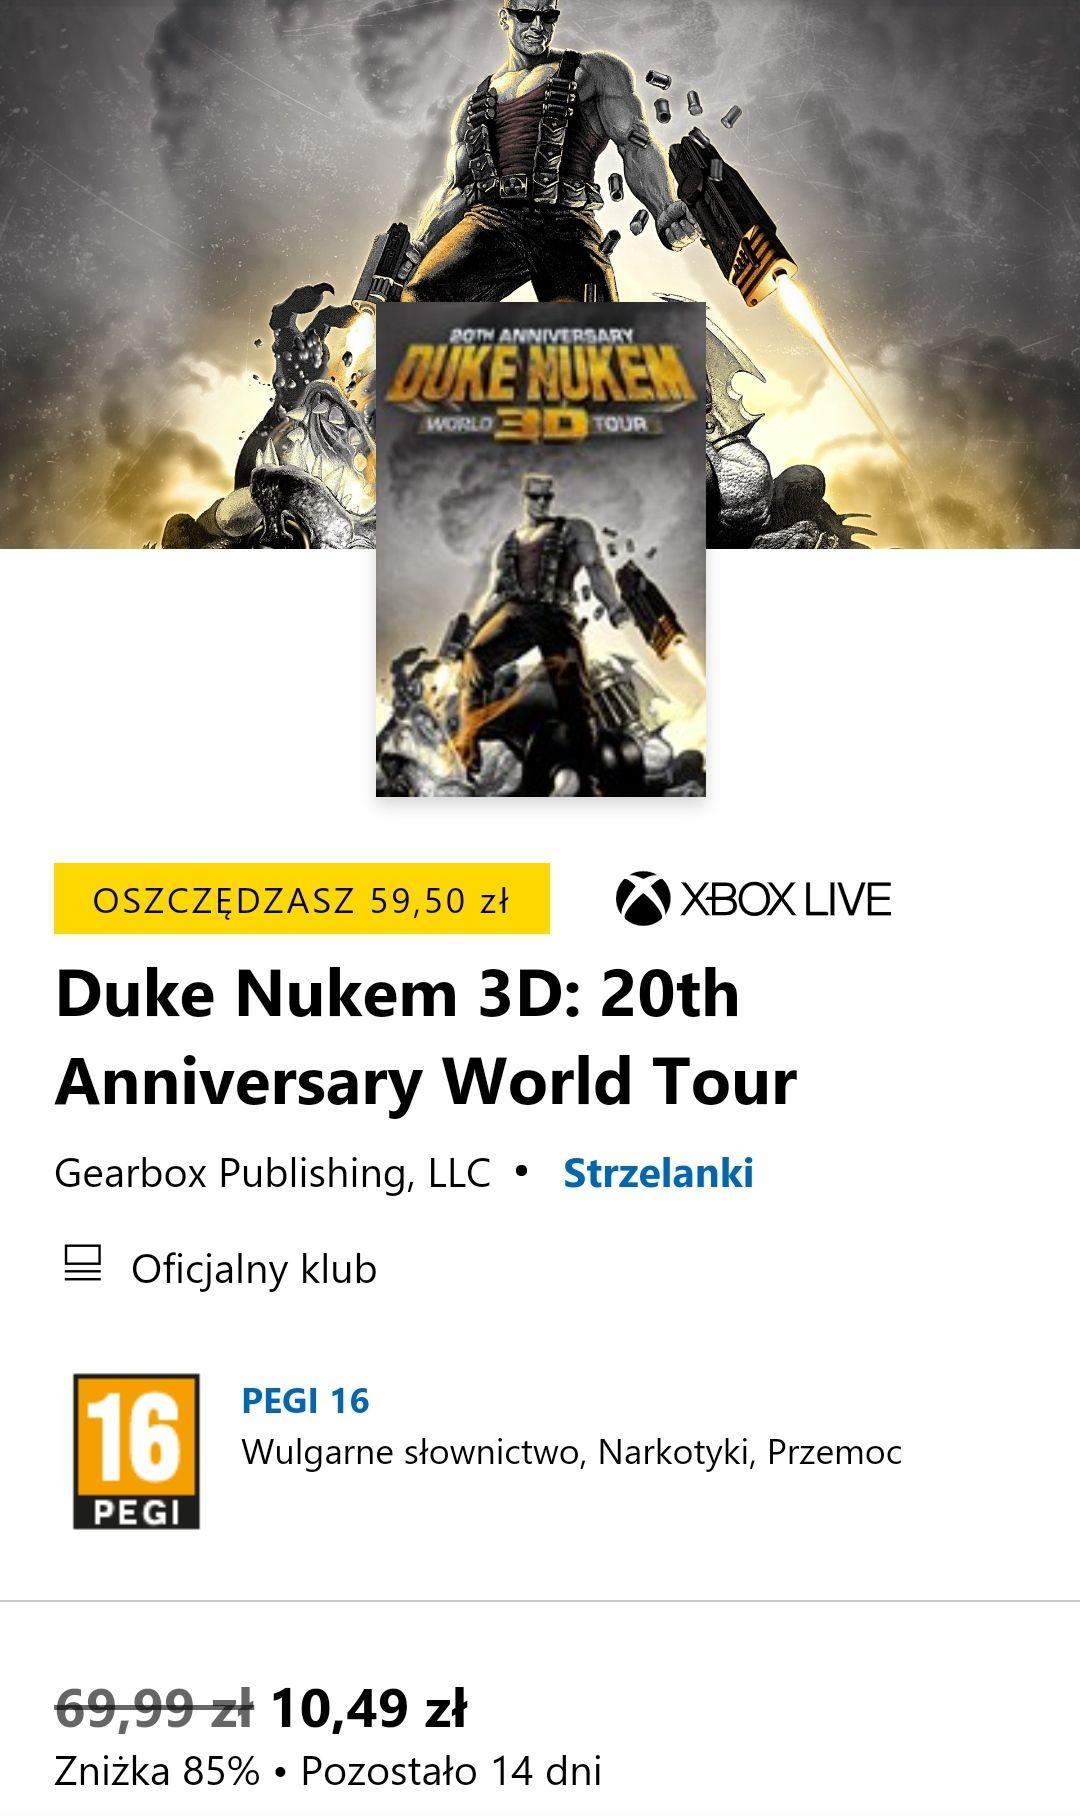 Duke Nukem 3D: 20th Anniversary World Tour xbox